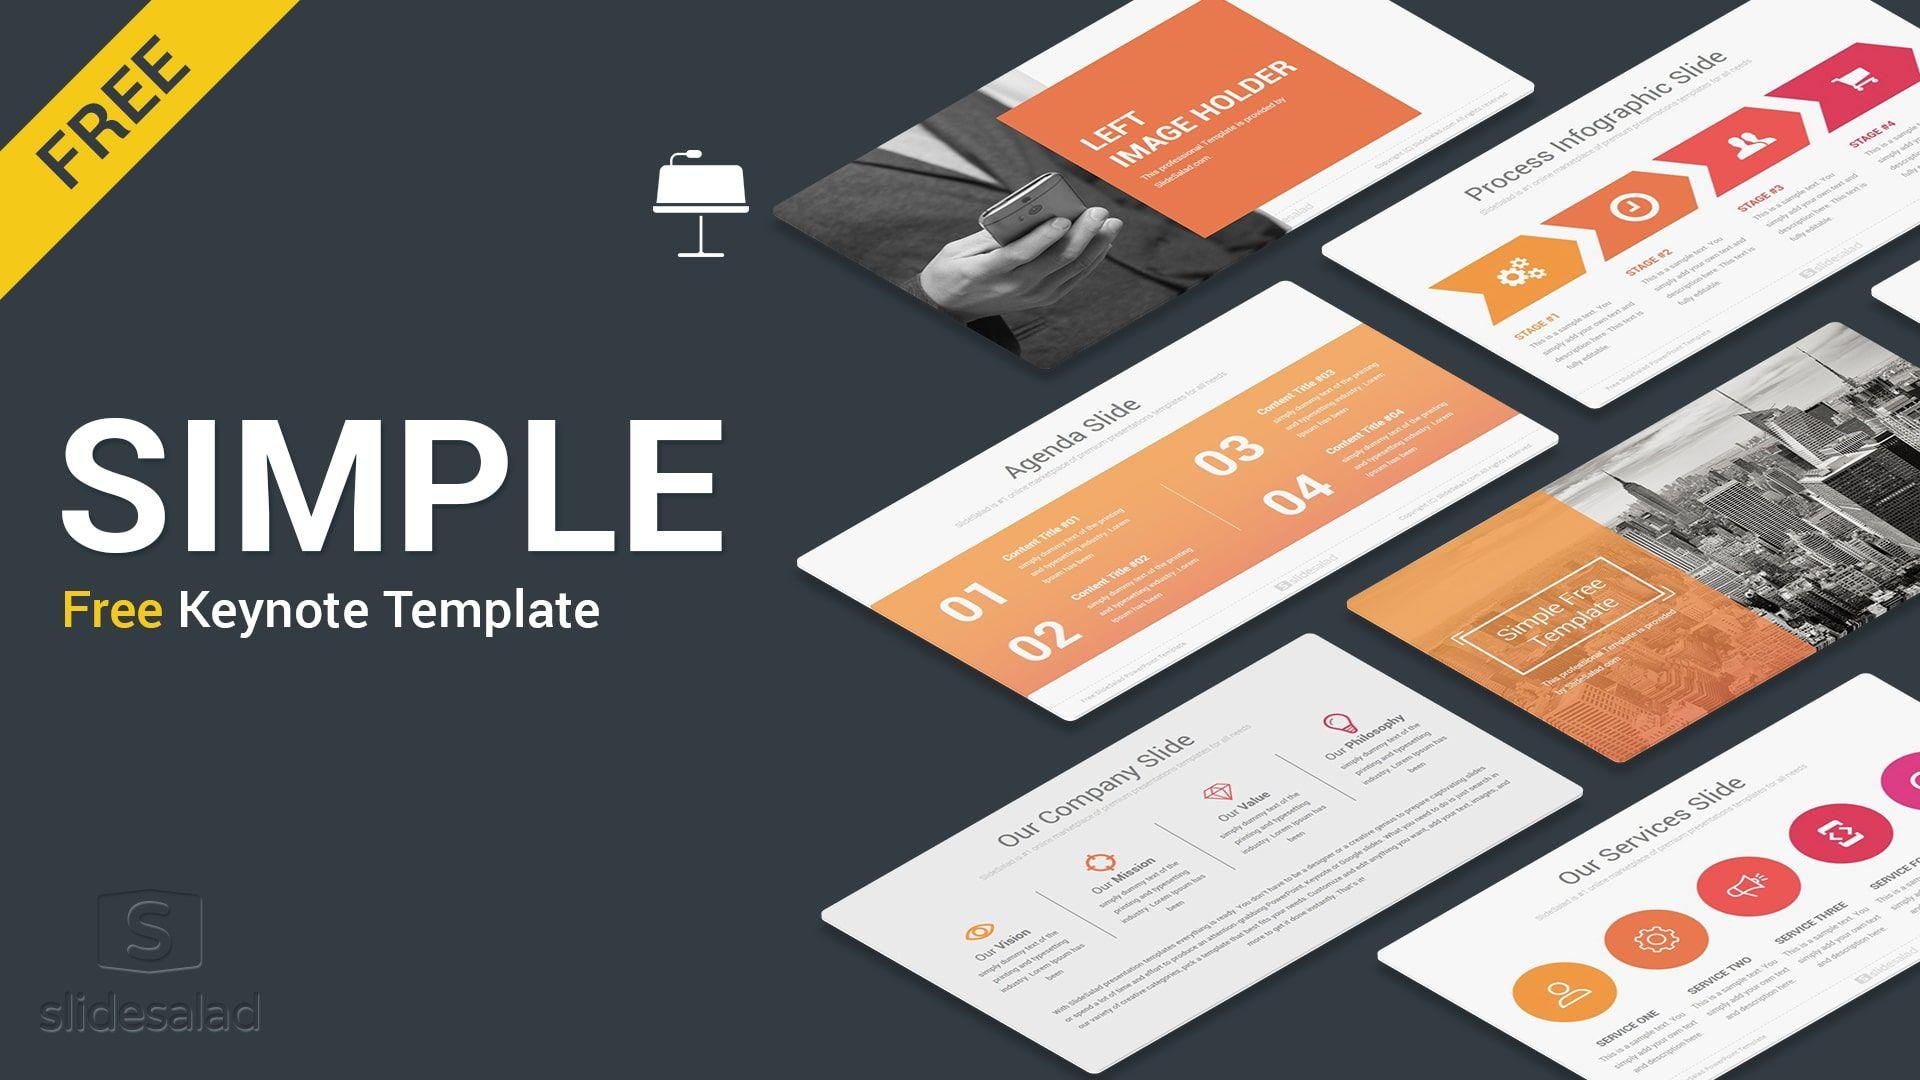 Simple Free Keynote Presentation Template Free Download